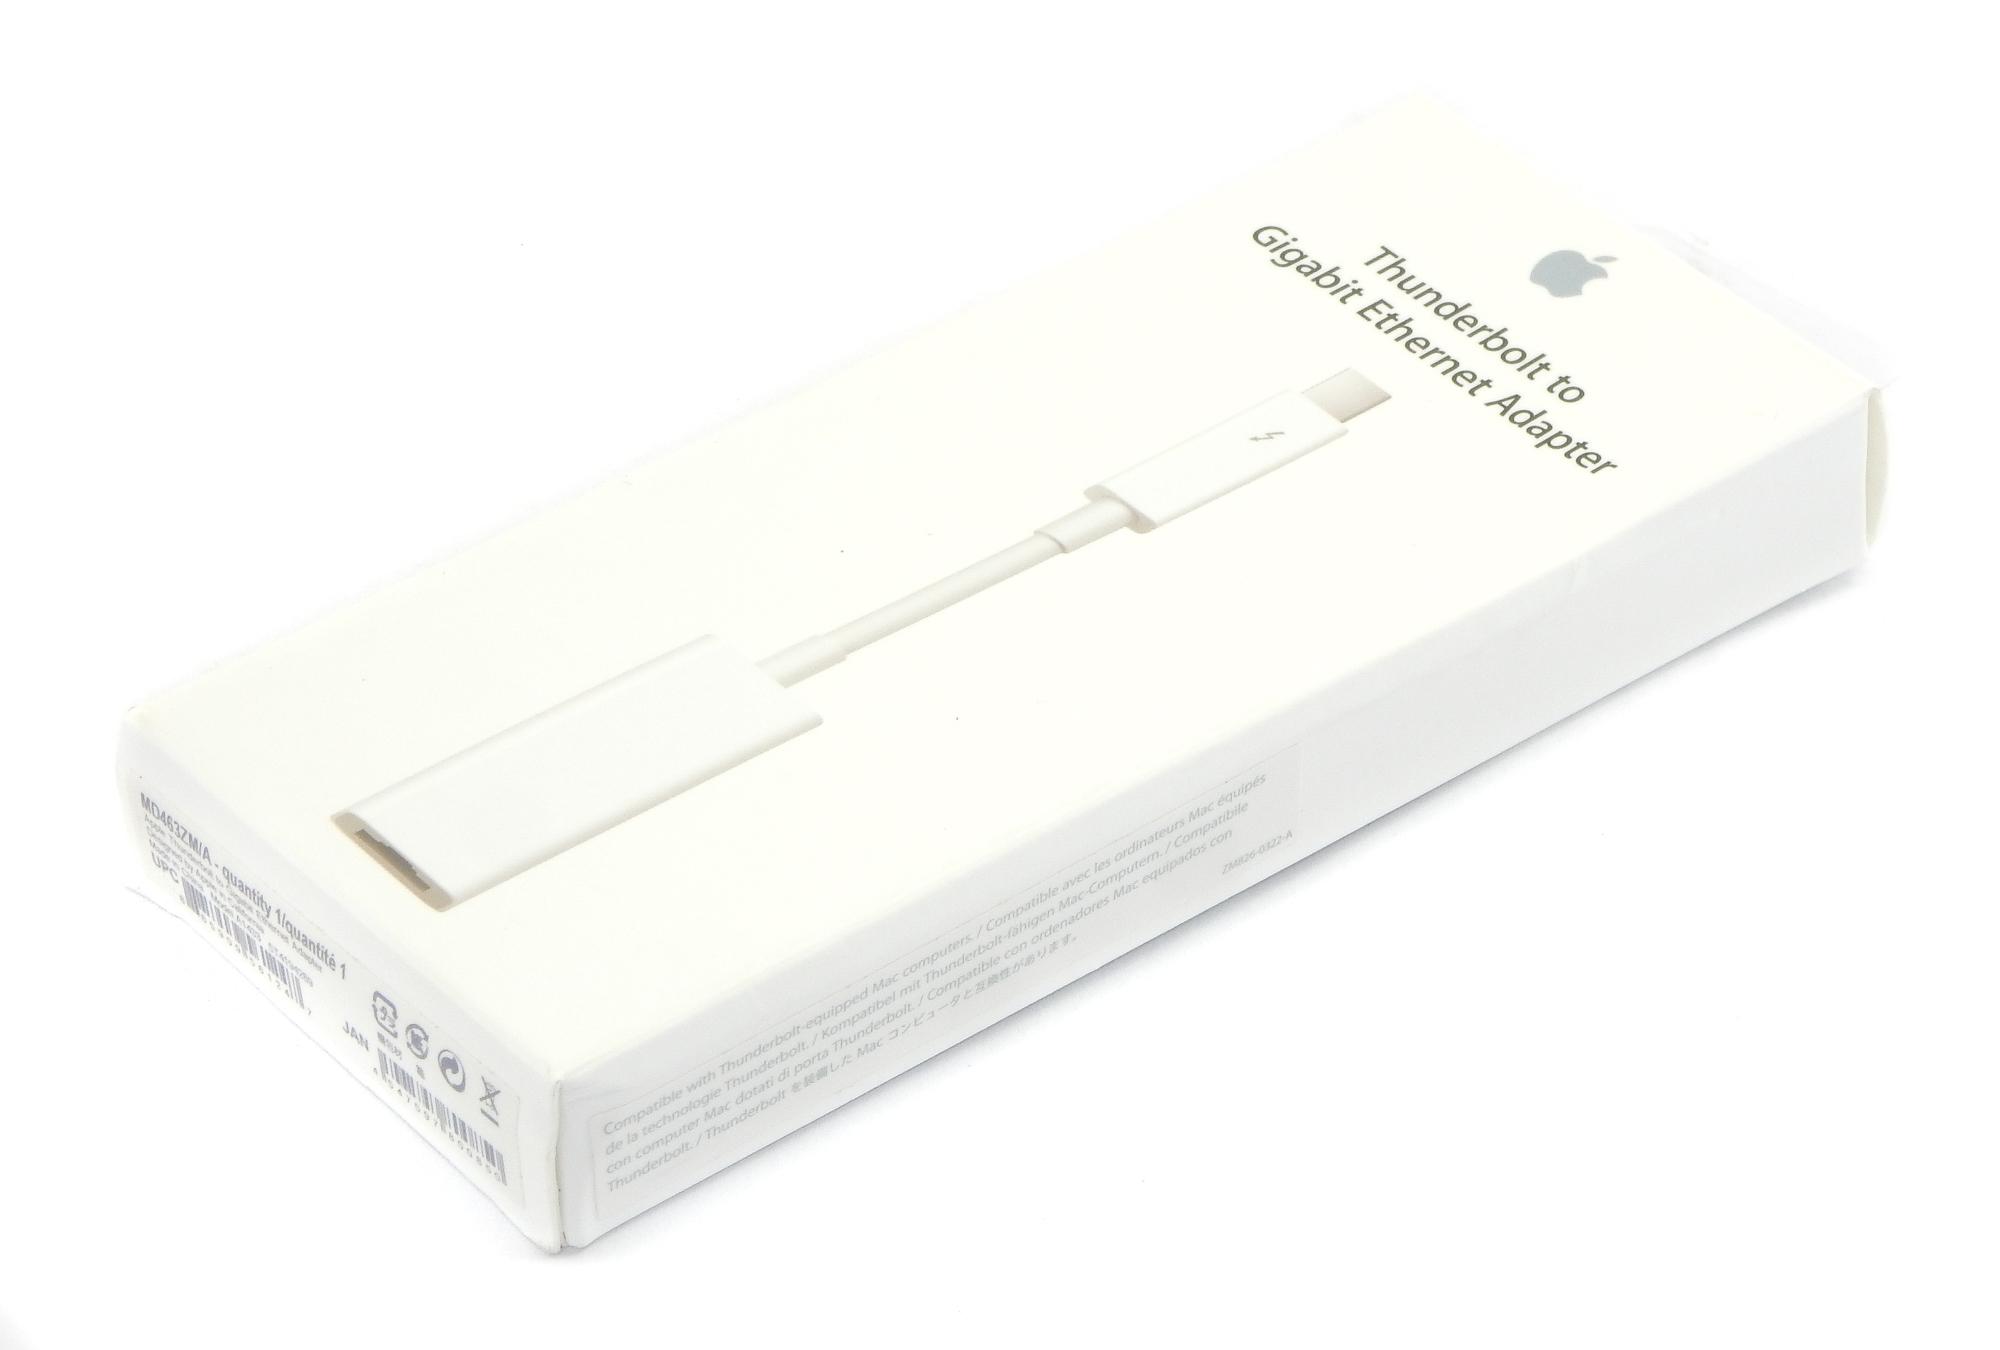 Genuine A1433 Apple Thunderbolt To Gigabit Ethernet Adapter - MD463ZM/A